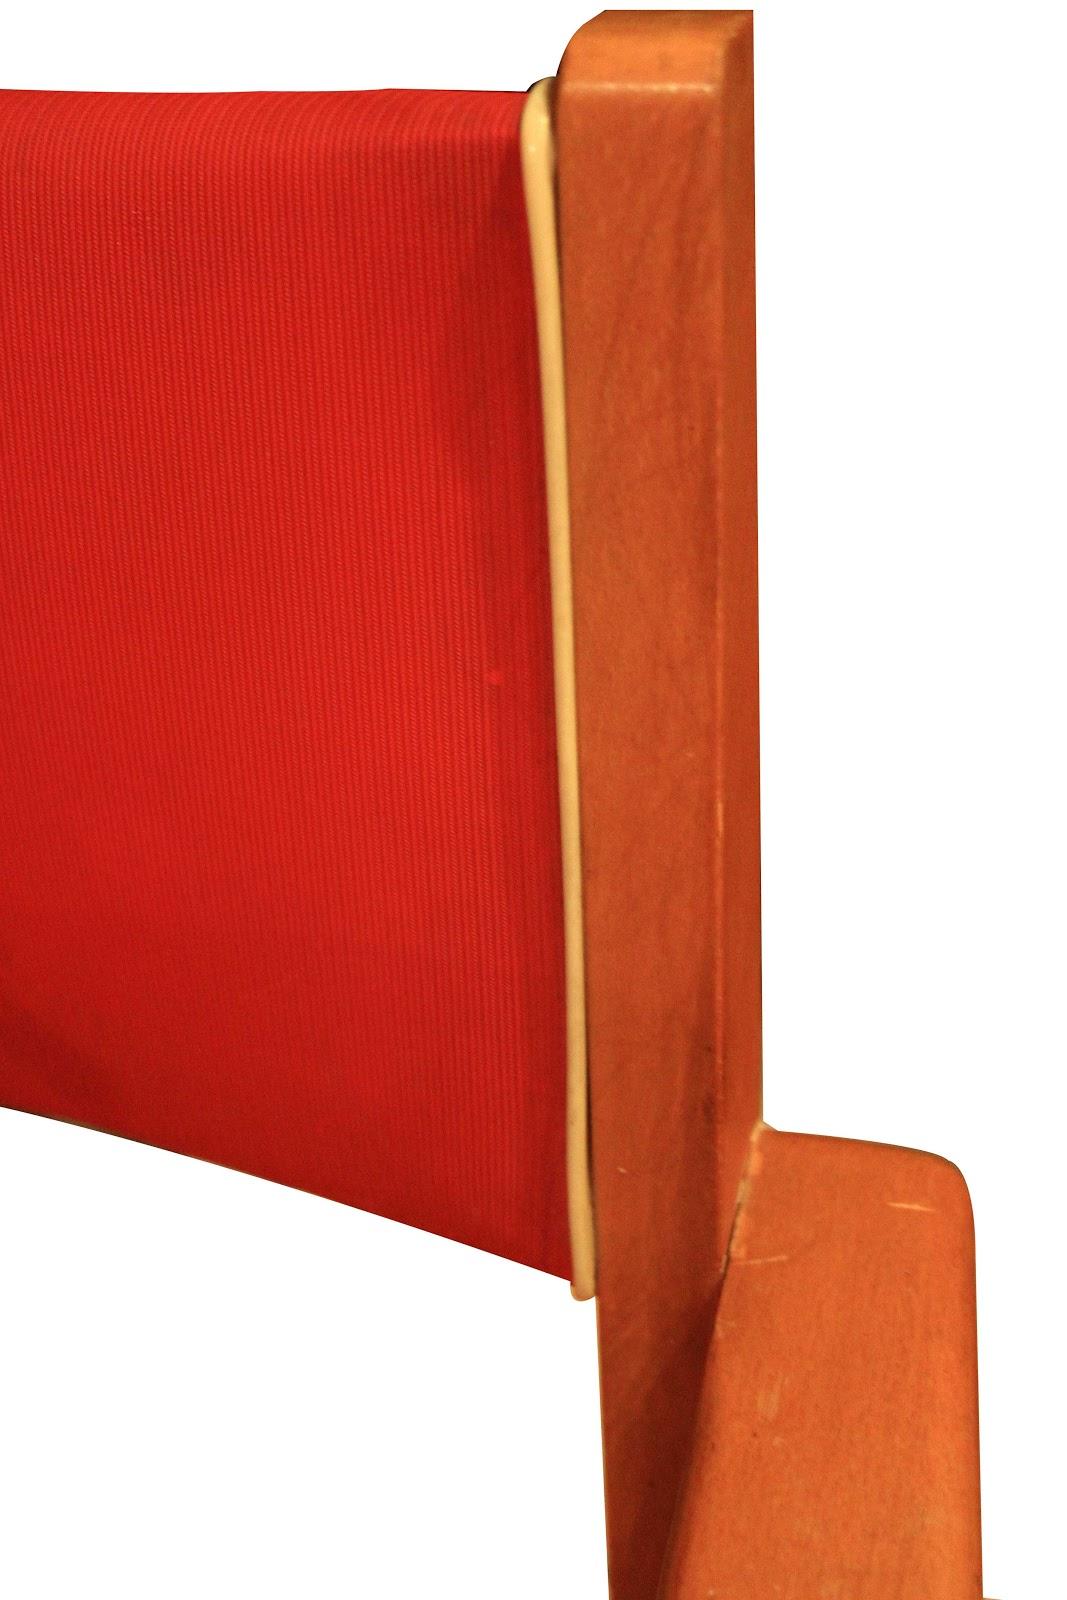 chicbaazar objets vintage 50 60 70 petit fauteuil bridge ska rouge 1950. Black Bedroom Furniture Sets. Home Design Ideas